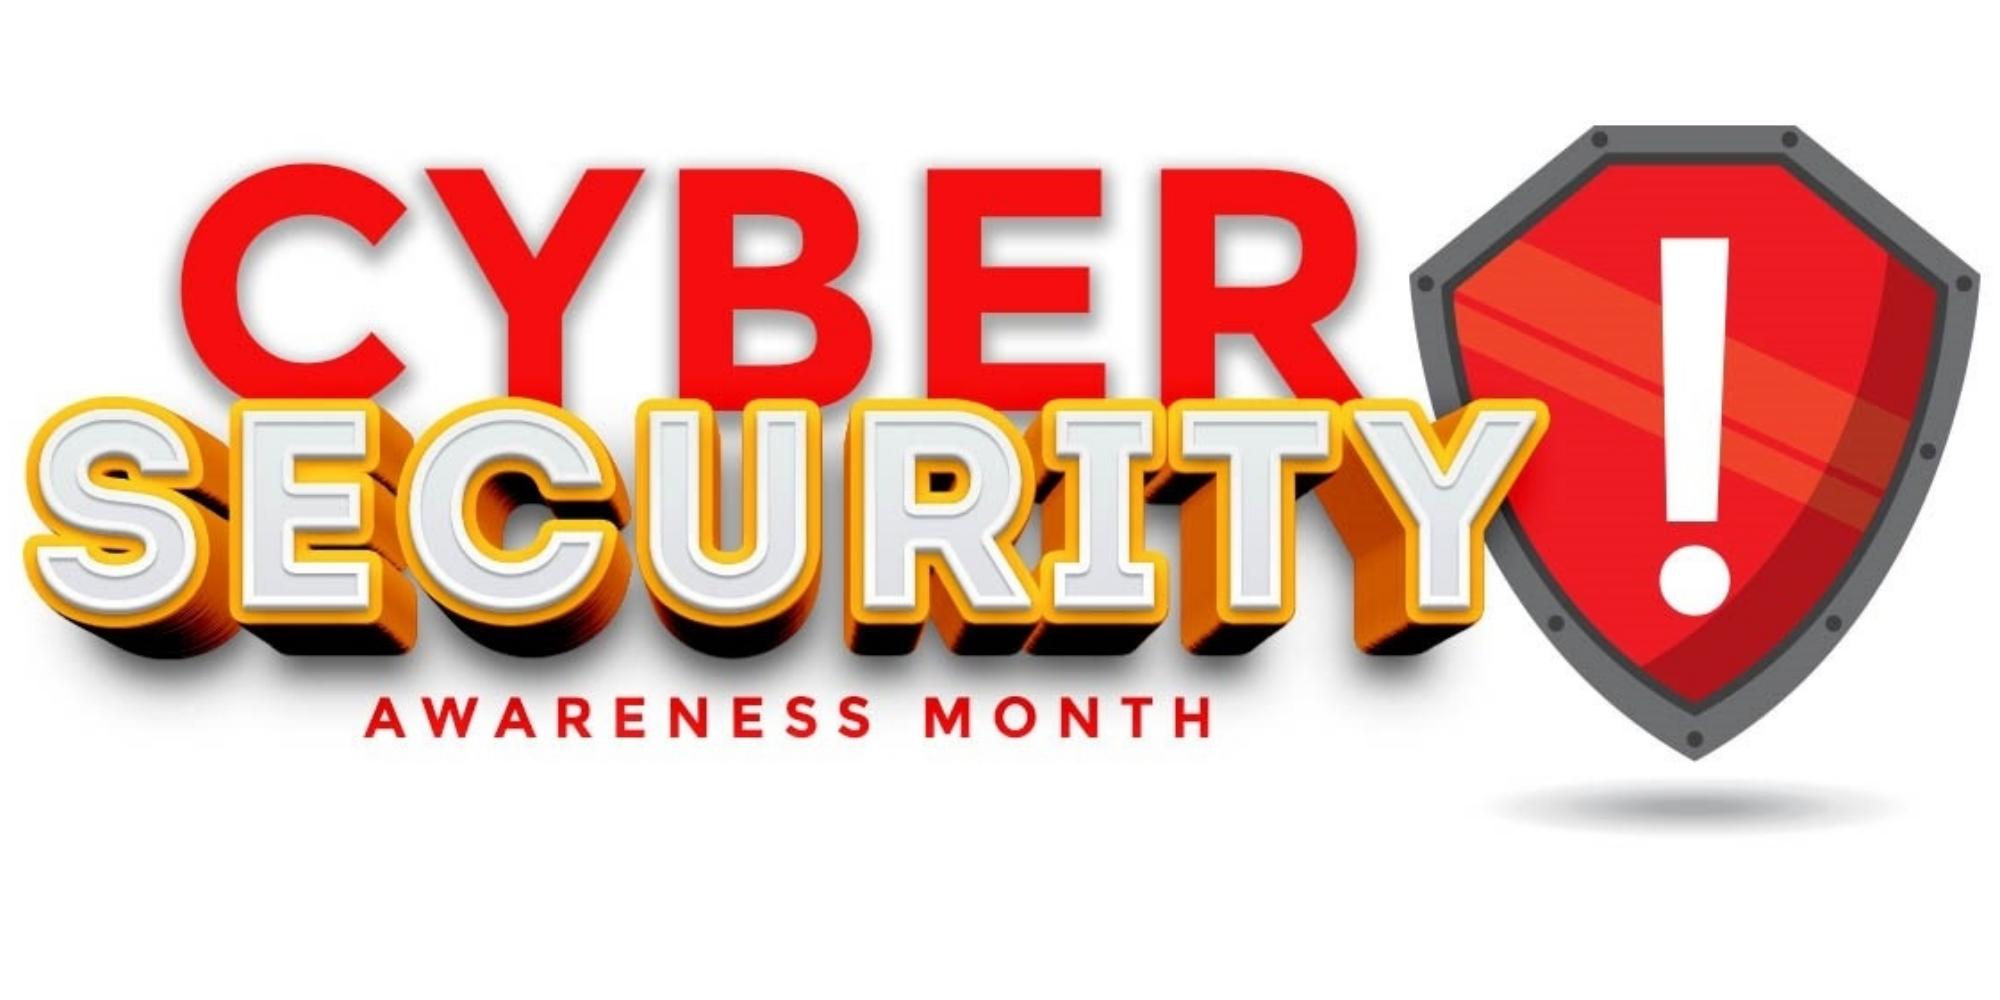 Cybersecurity Awareness: Not Just in October